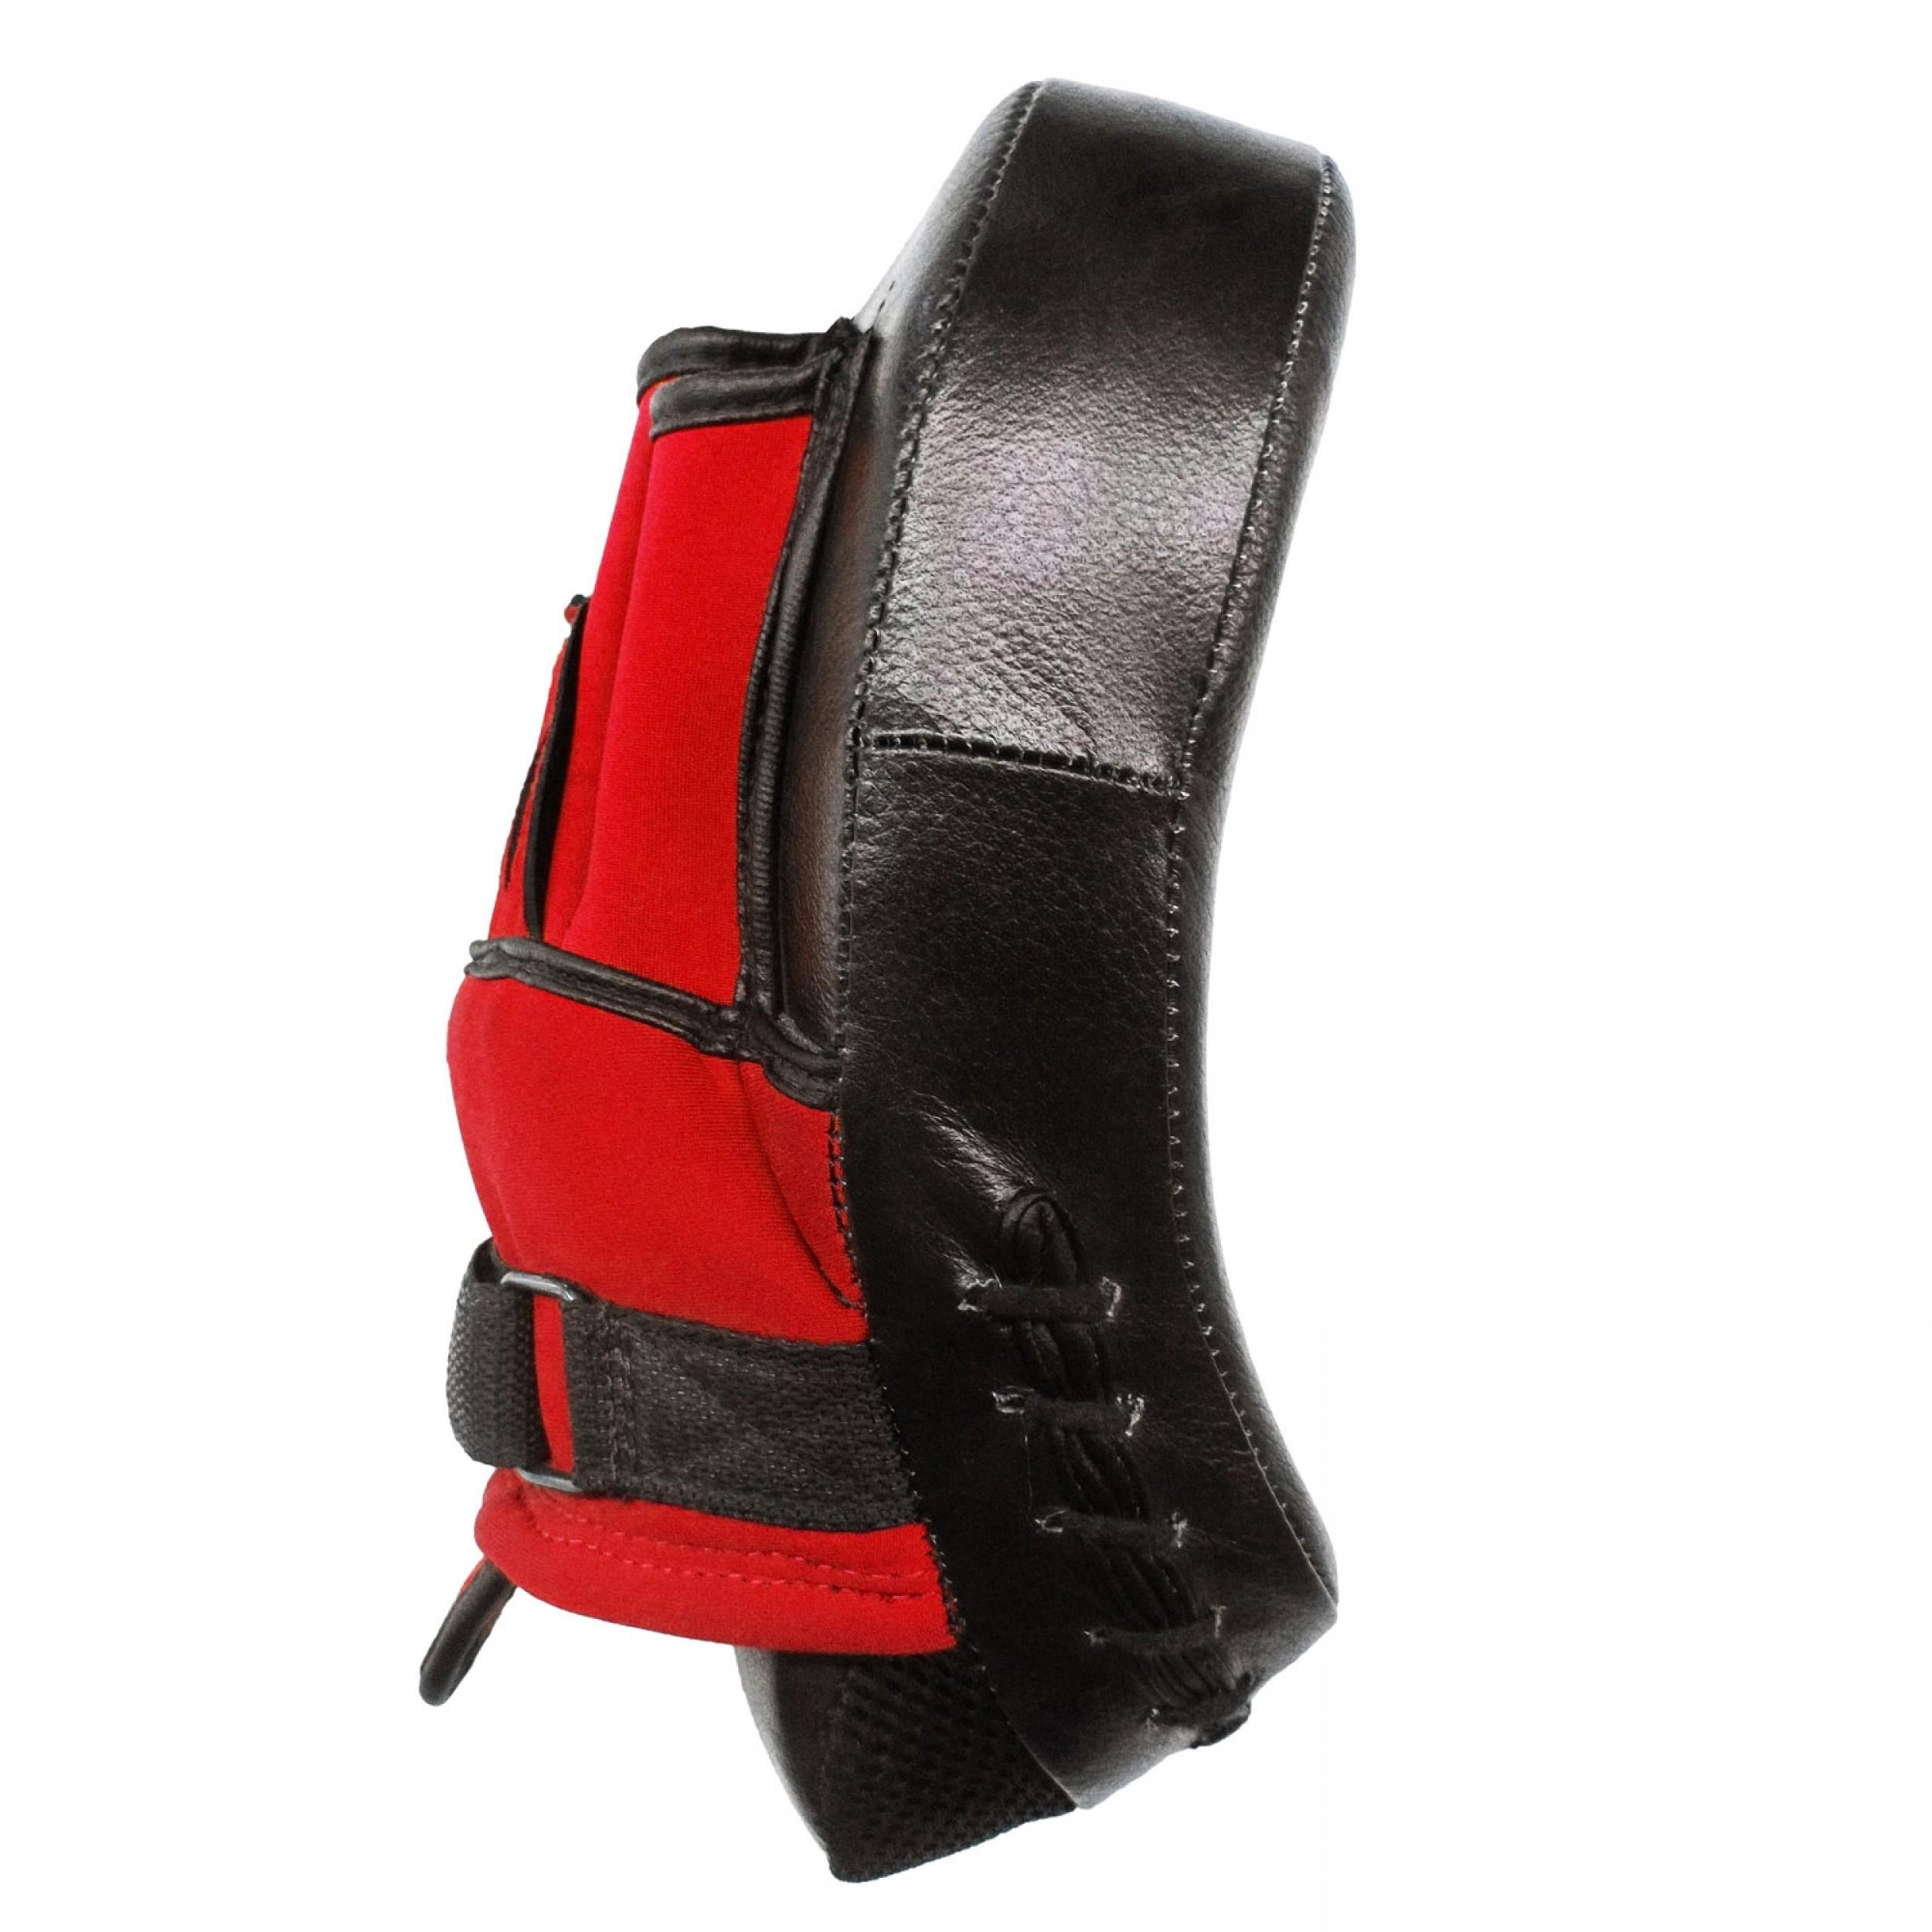 Focus Pad G/Leathe Black / Red